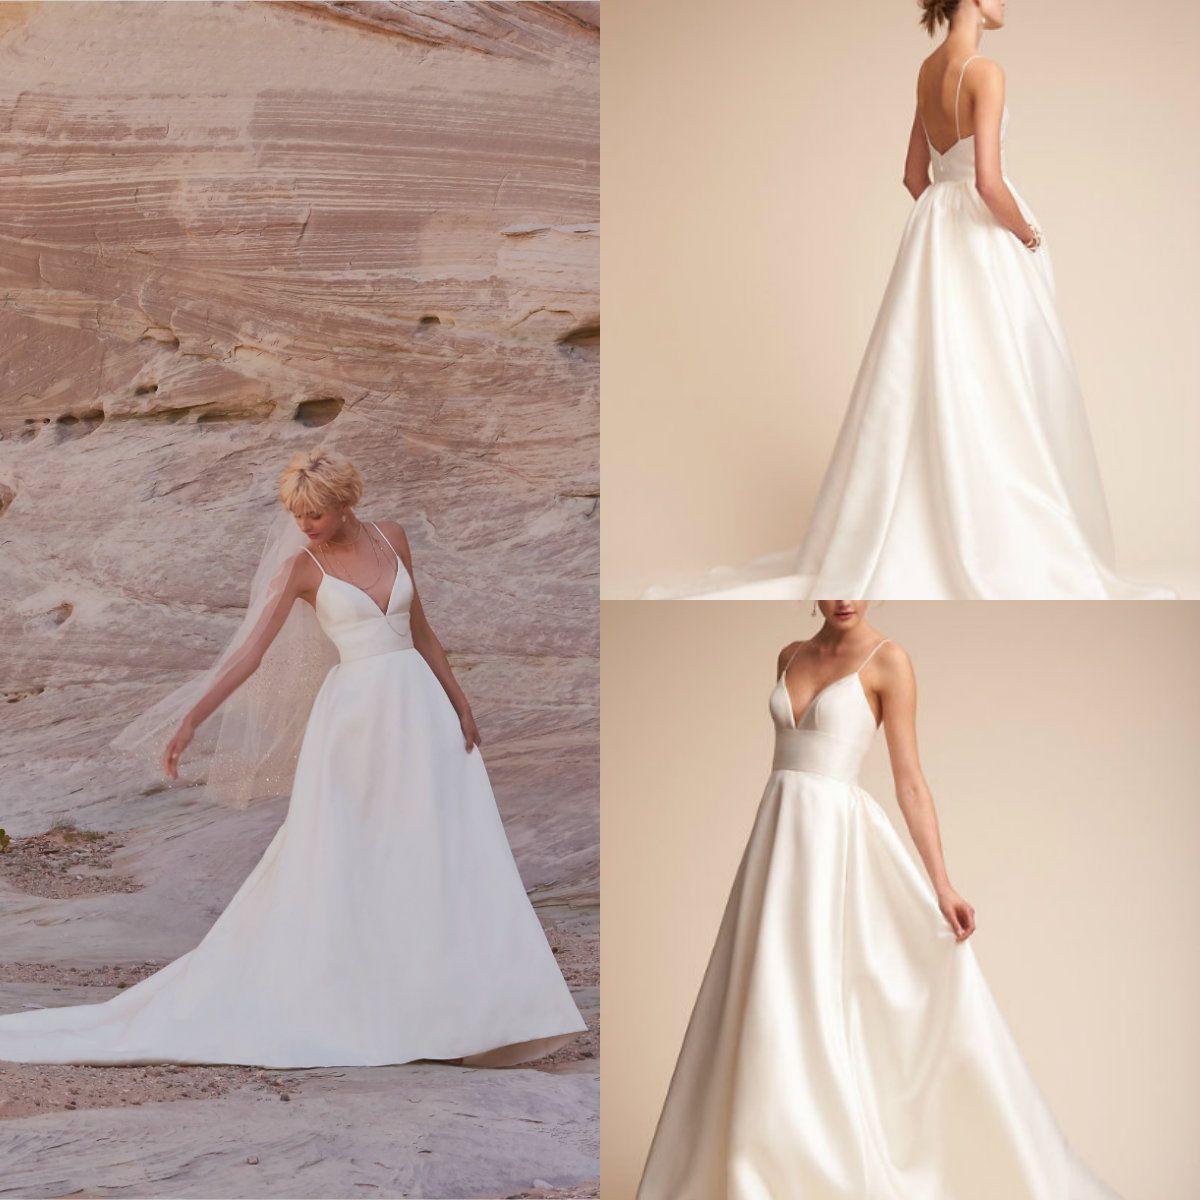 8f40f4eda2 Discount 2018 BHLDN A Line Beach Wedding Dresses Spaghetti Sweep Train  Satin Backless Country Bridal Dress Plus Size Cheap Ivory Wedding Gowns  Elegant ...